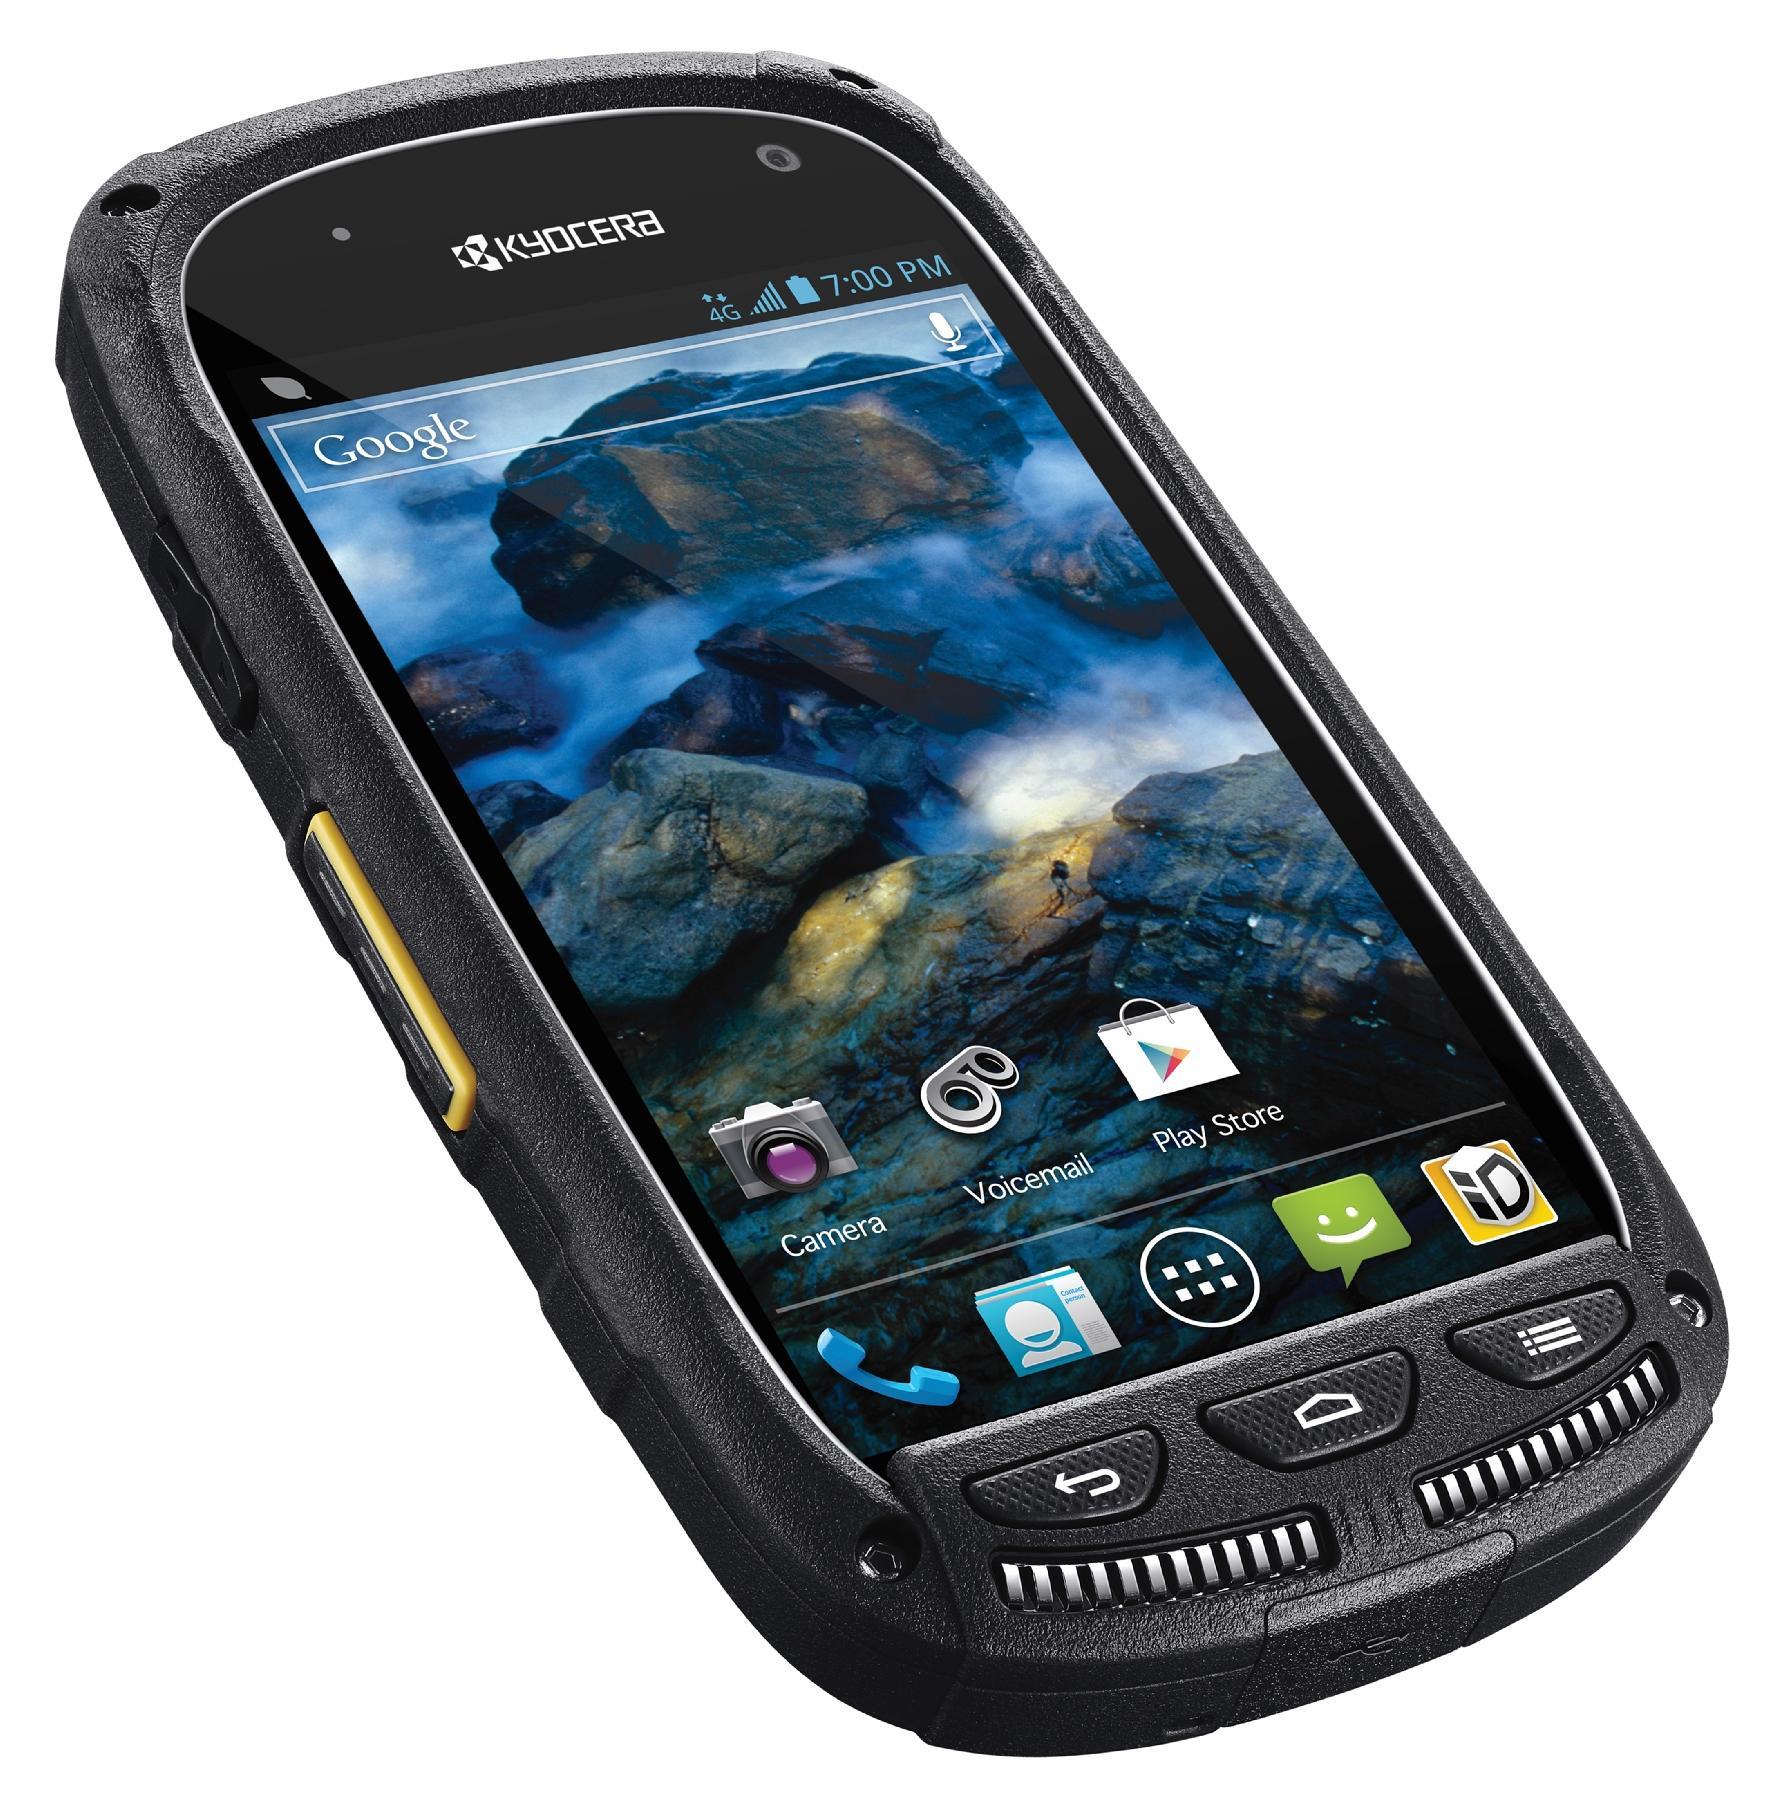 Kyocera Torgue - wodoodporny smartphone z akumulatorem 2500 mAh